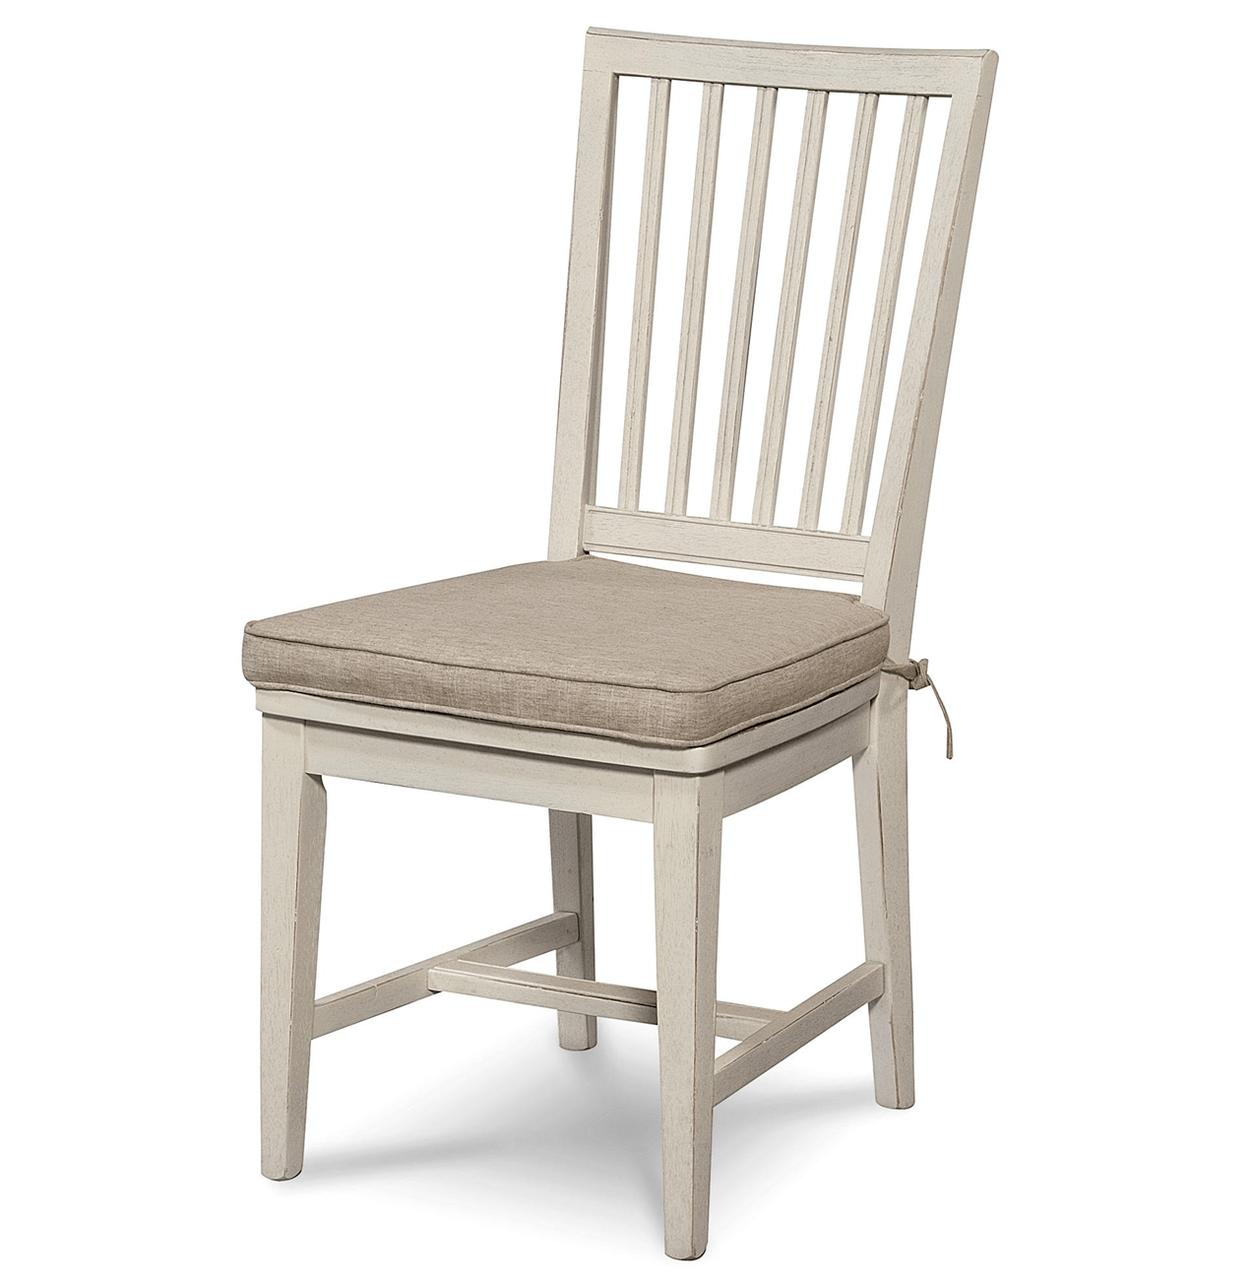 Coastal Beach White Dining Side Chair with Cushion  Zin Home